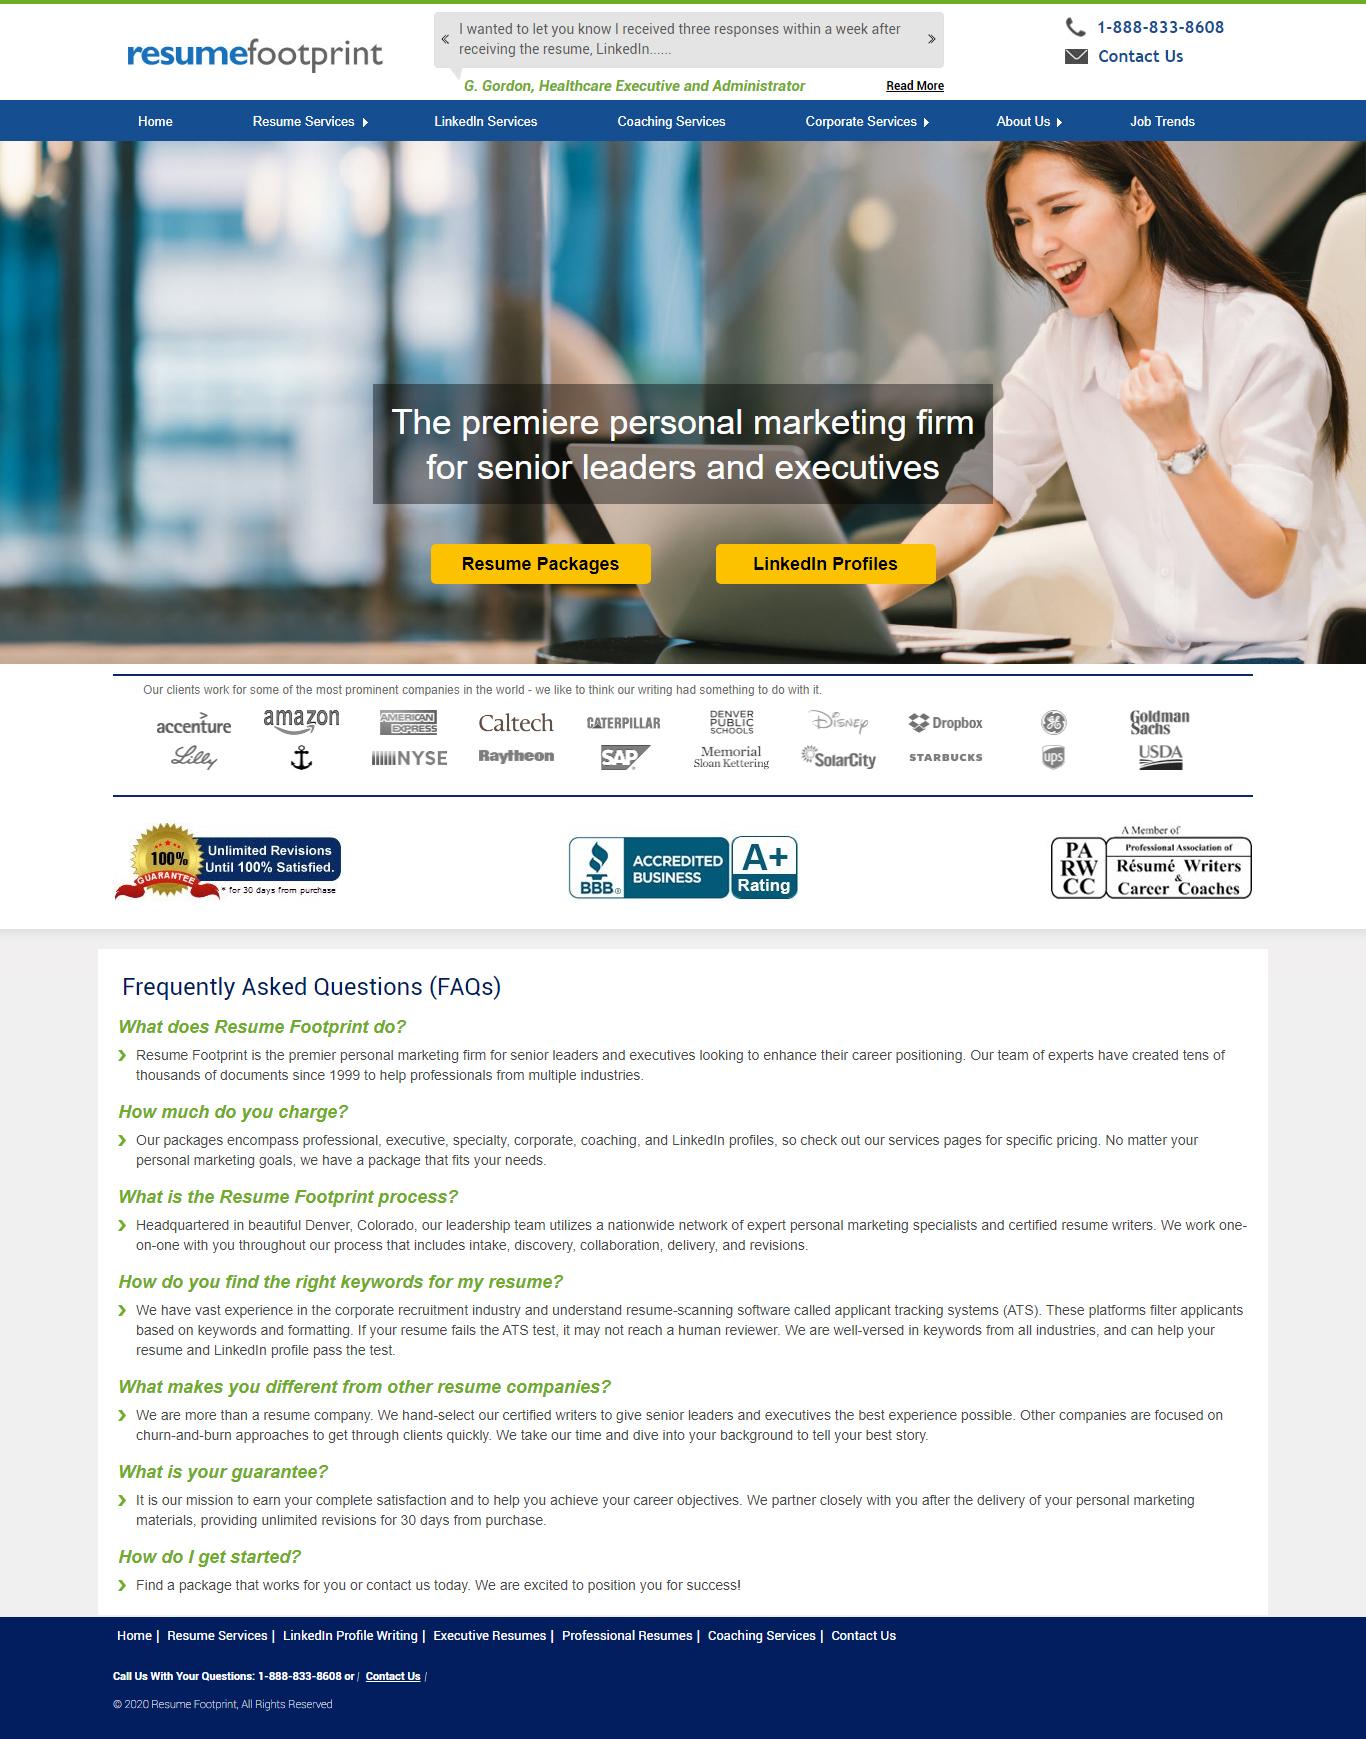 resumefootprint